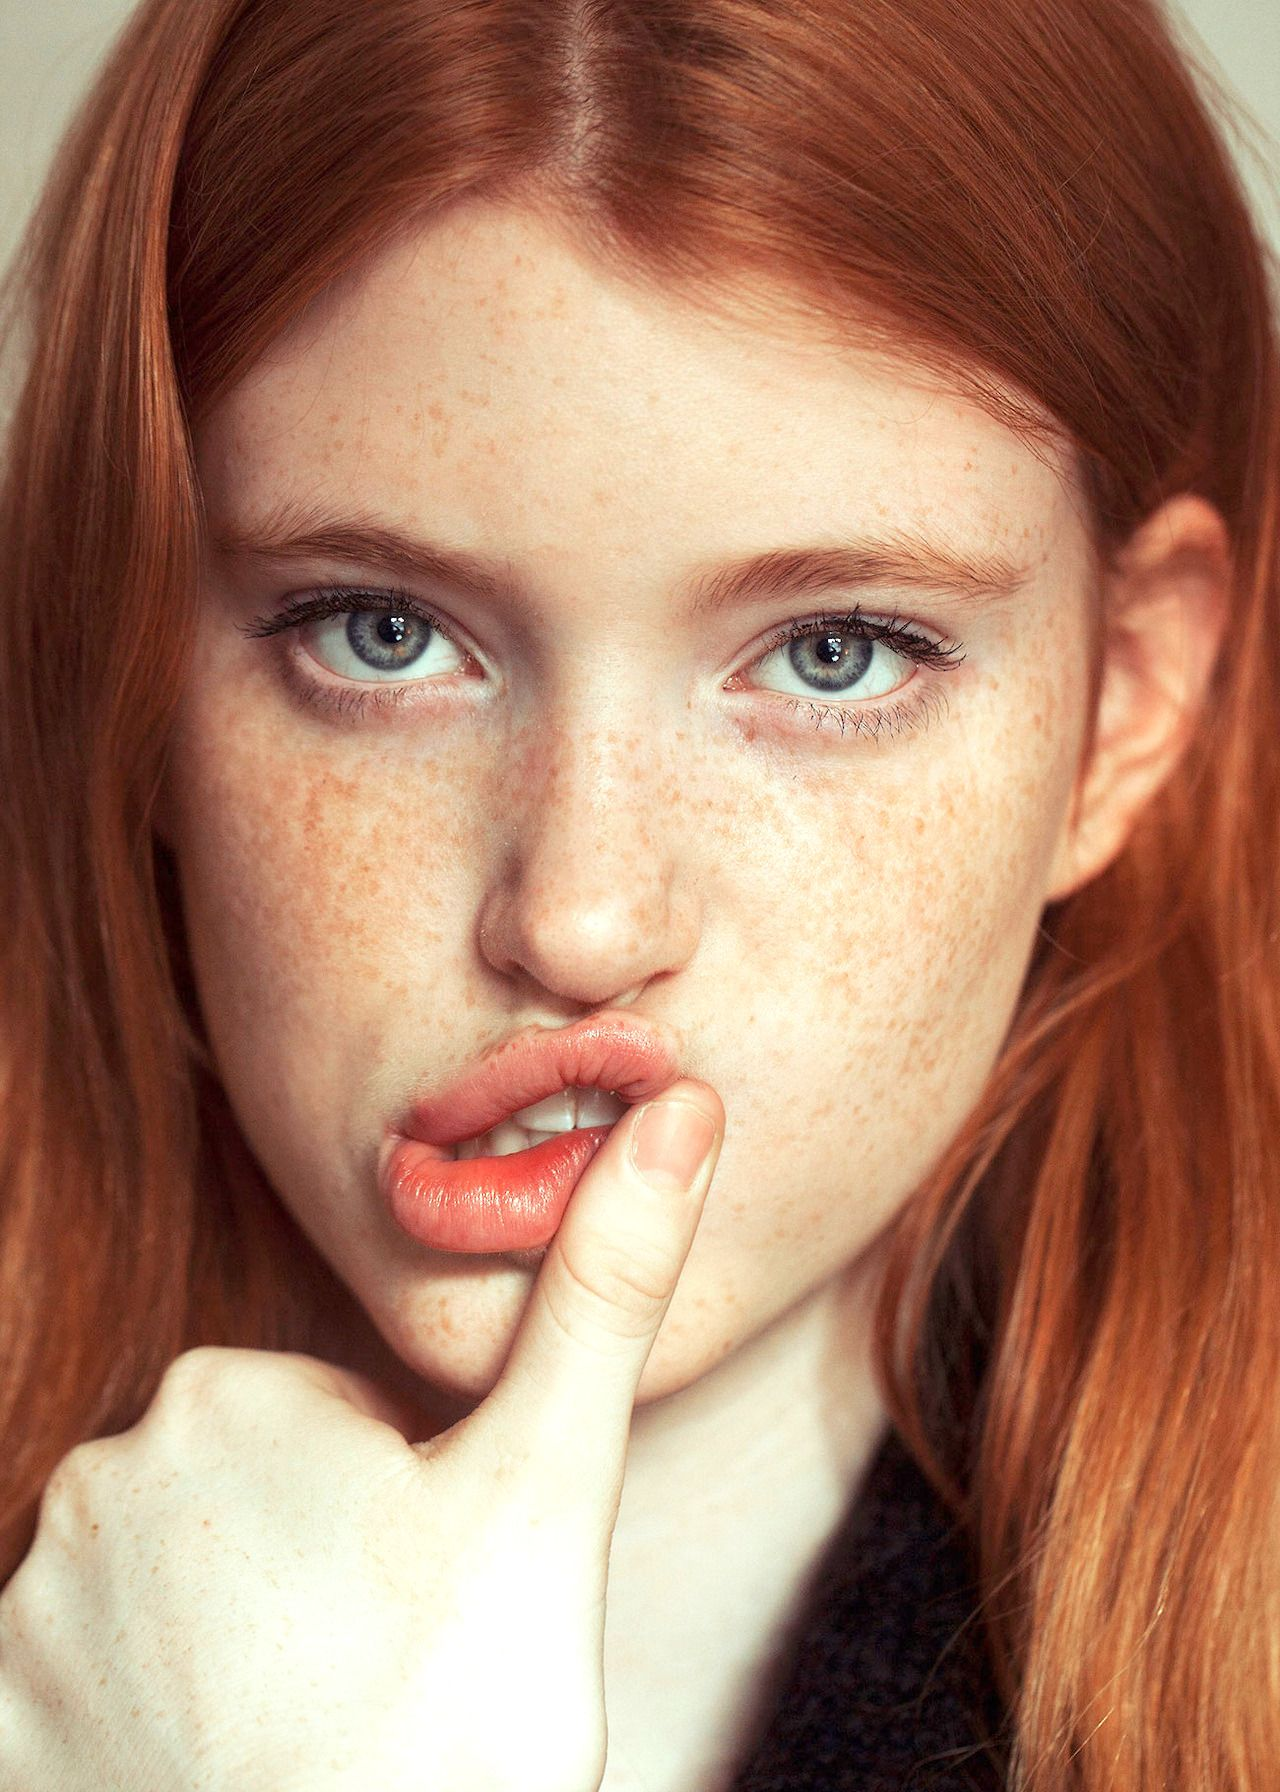 Tumblr the amazing redhead